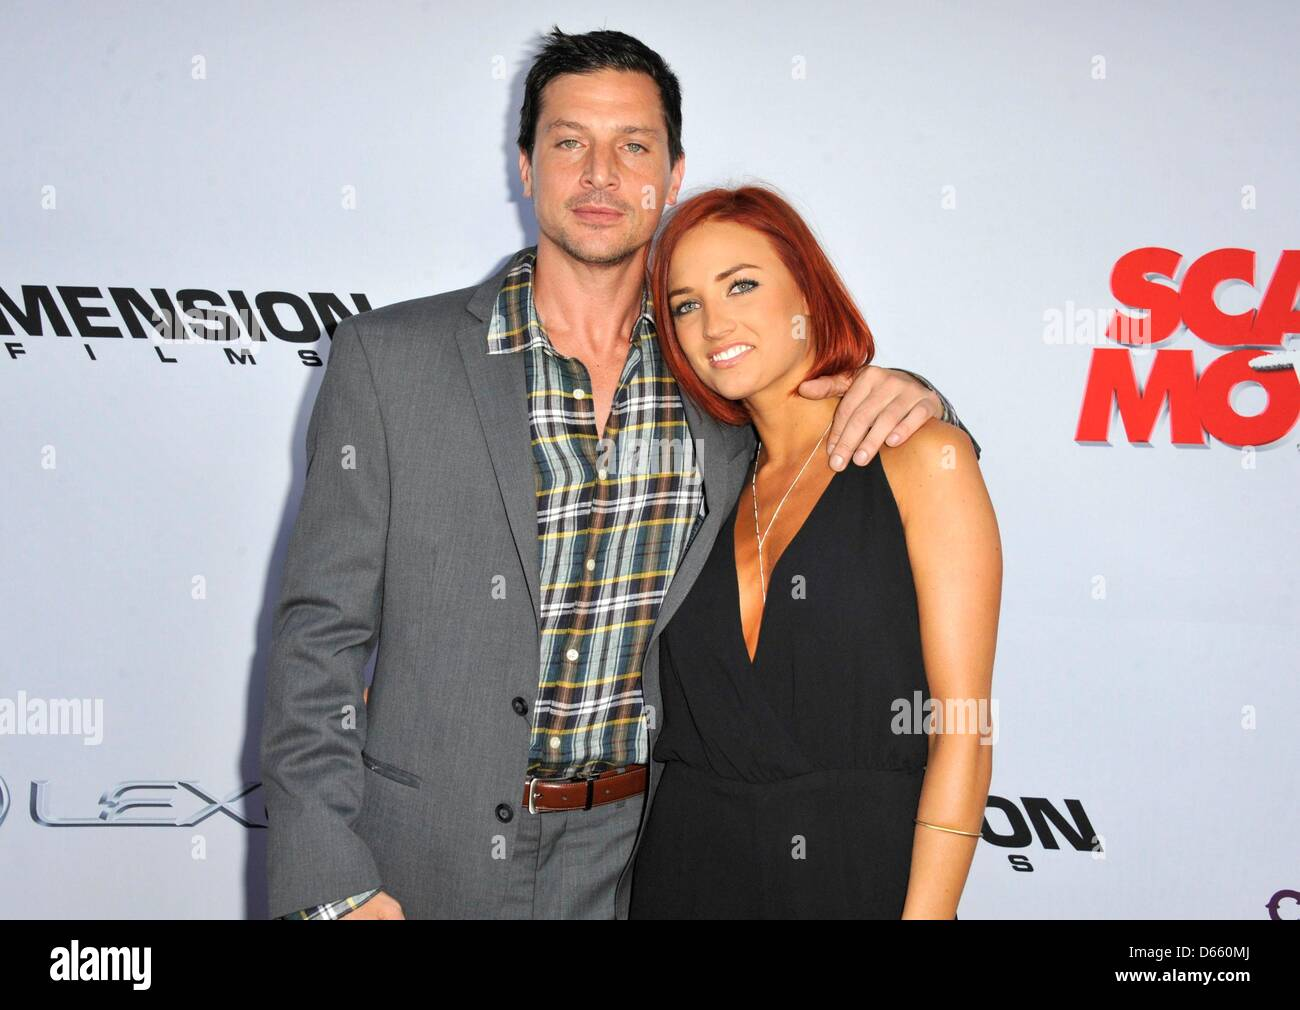 Simon rex dating 2013